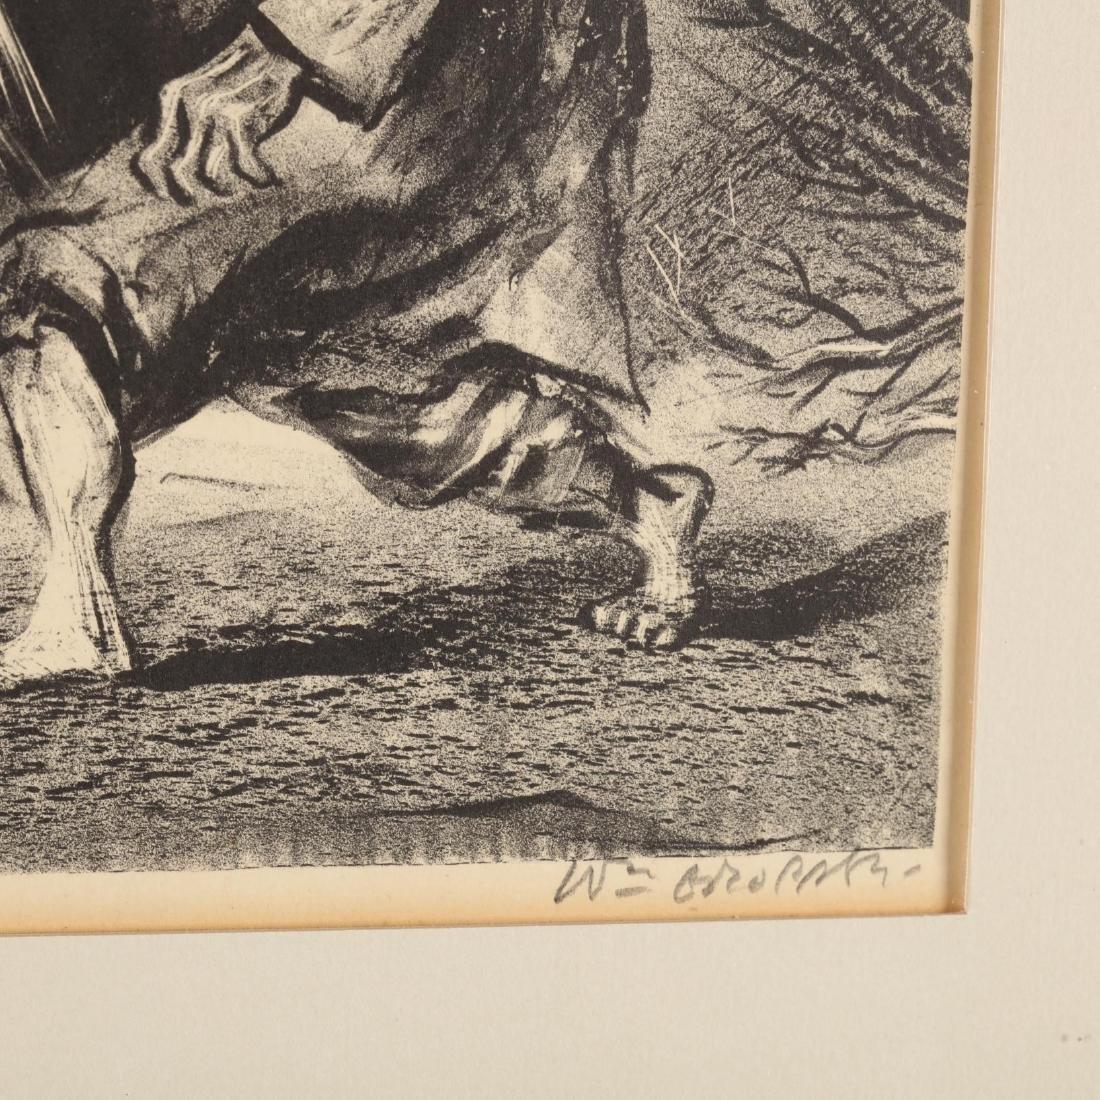 Two Framed Prints - Blake and Gropper - 7